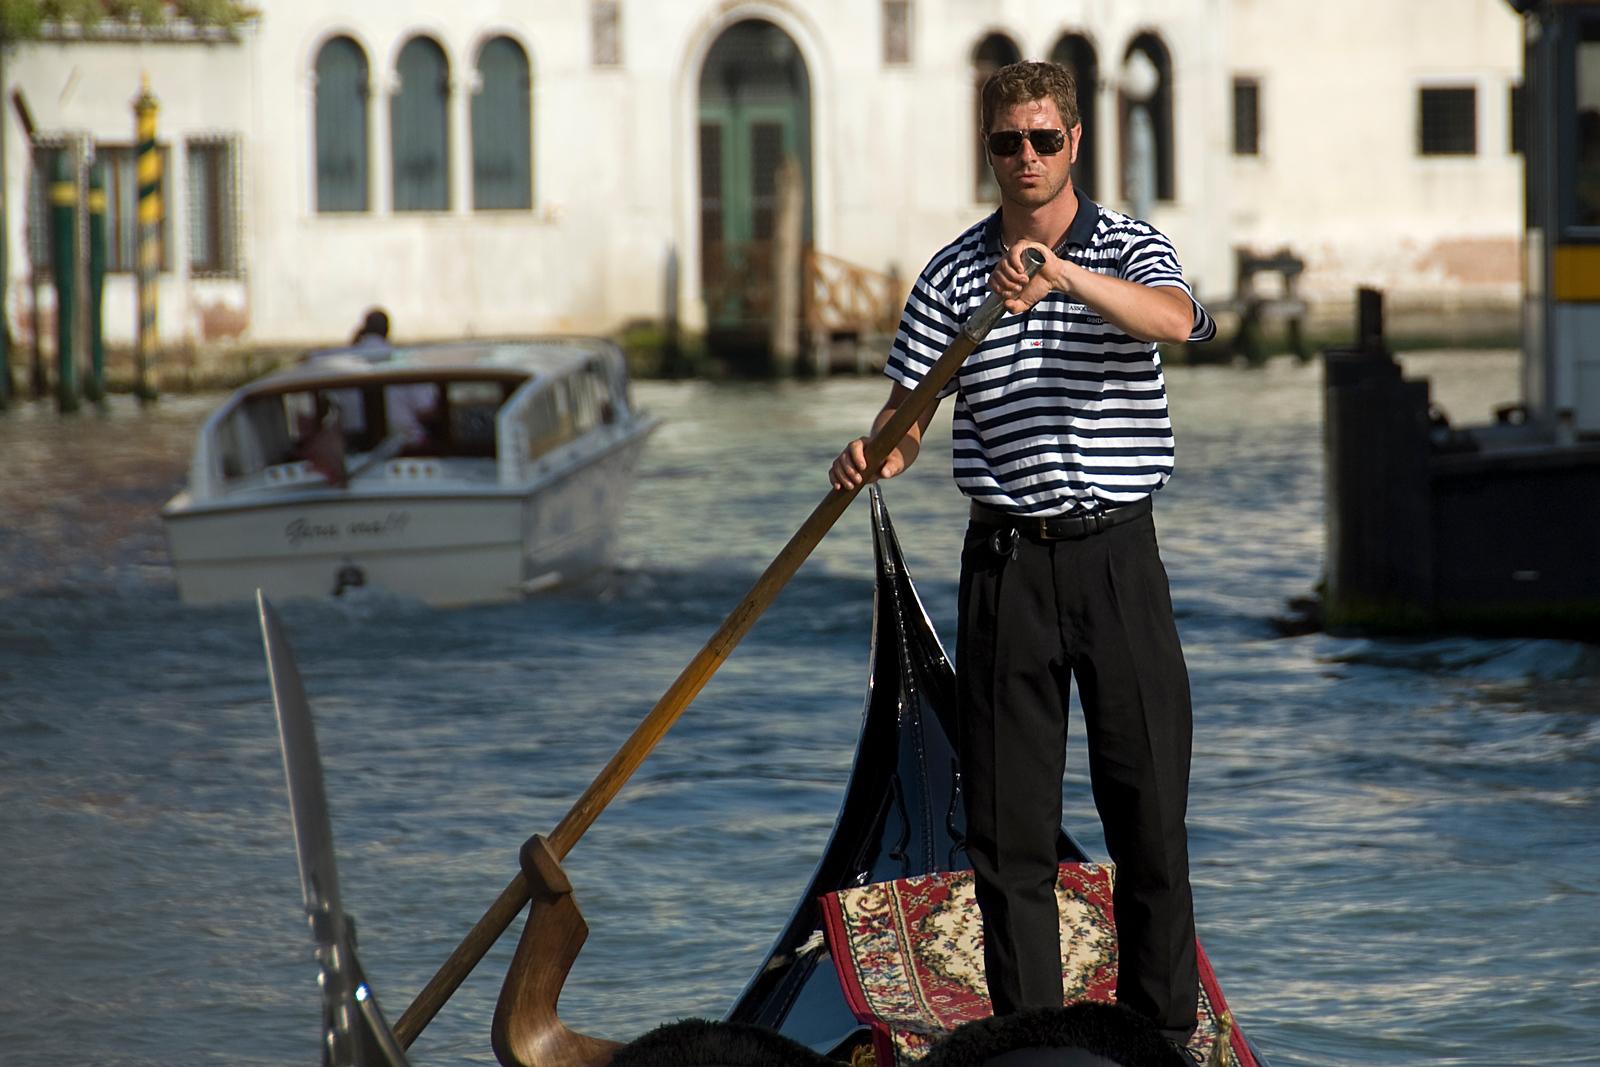 Gondolier wearing stripes in Venice, Italy